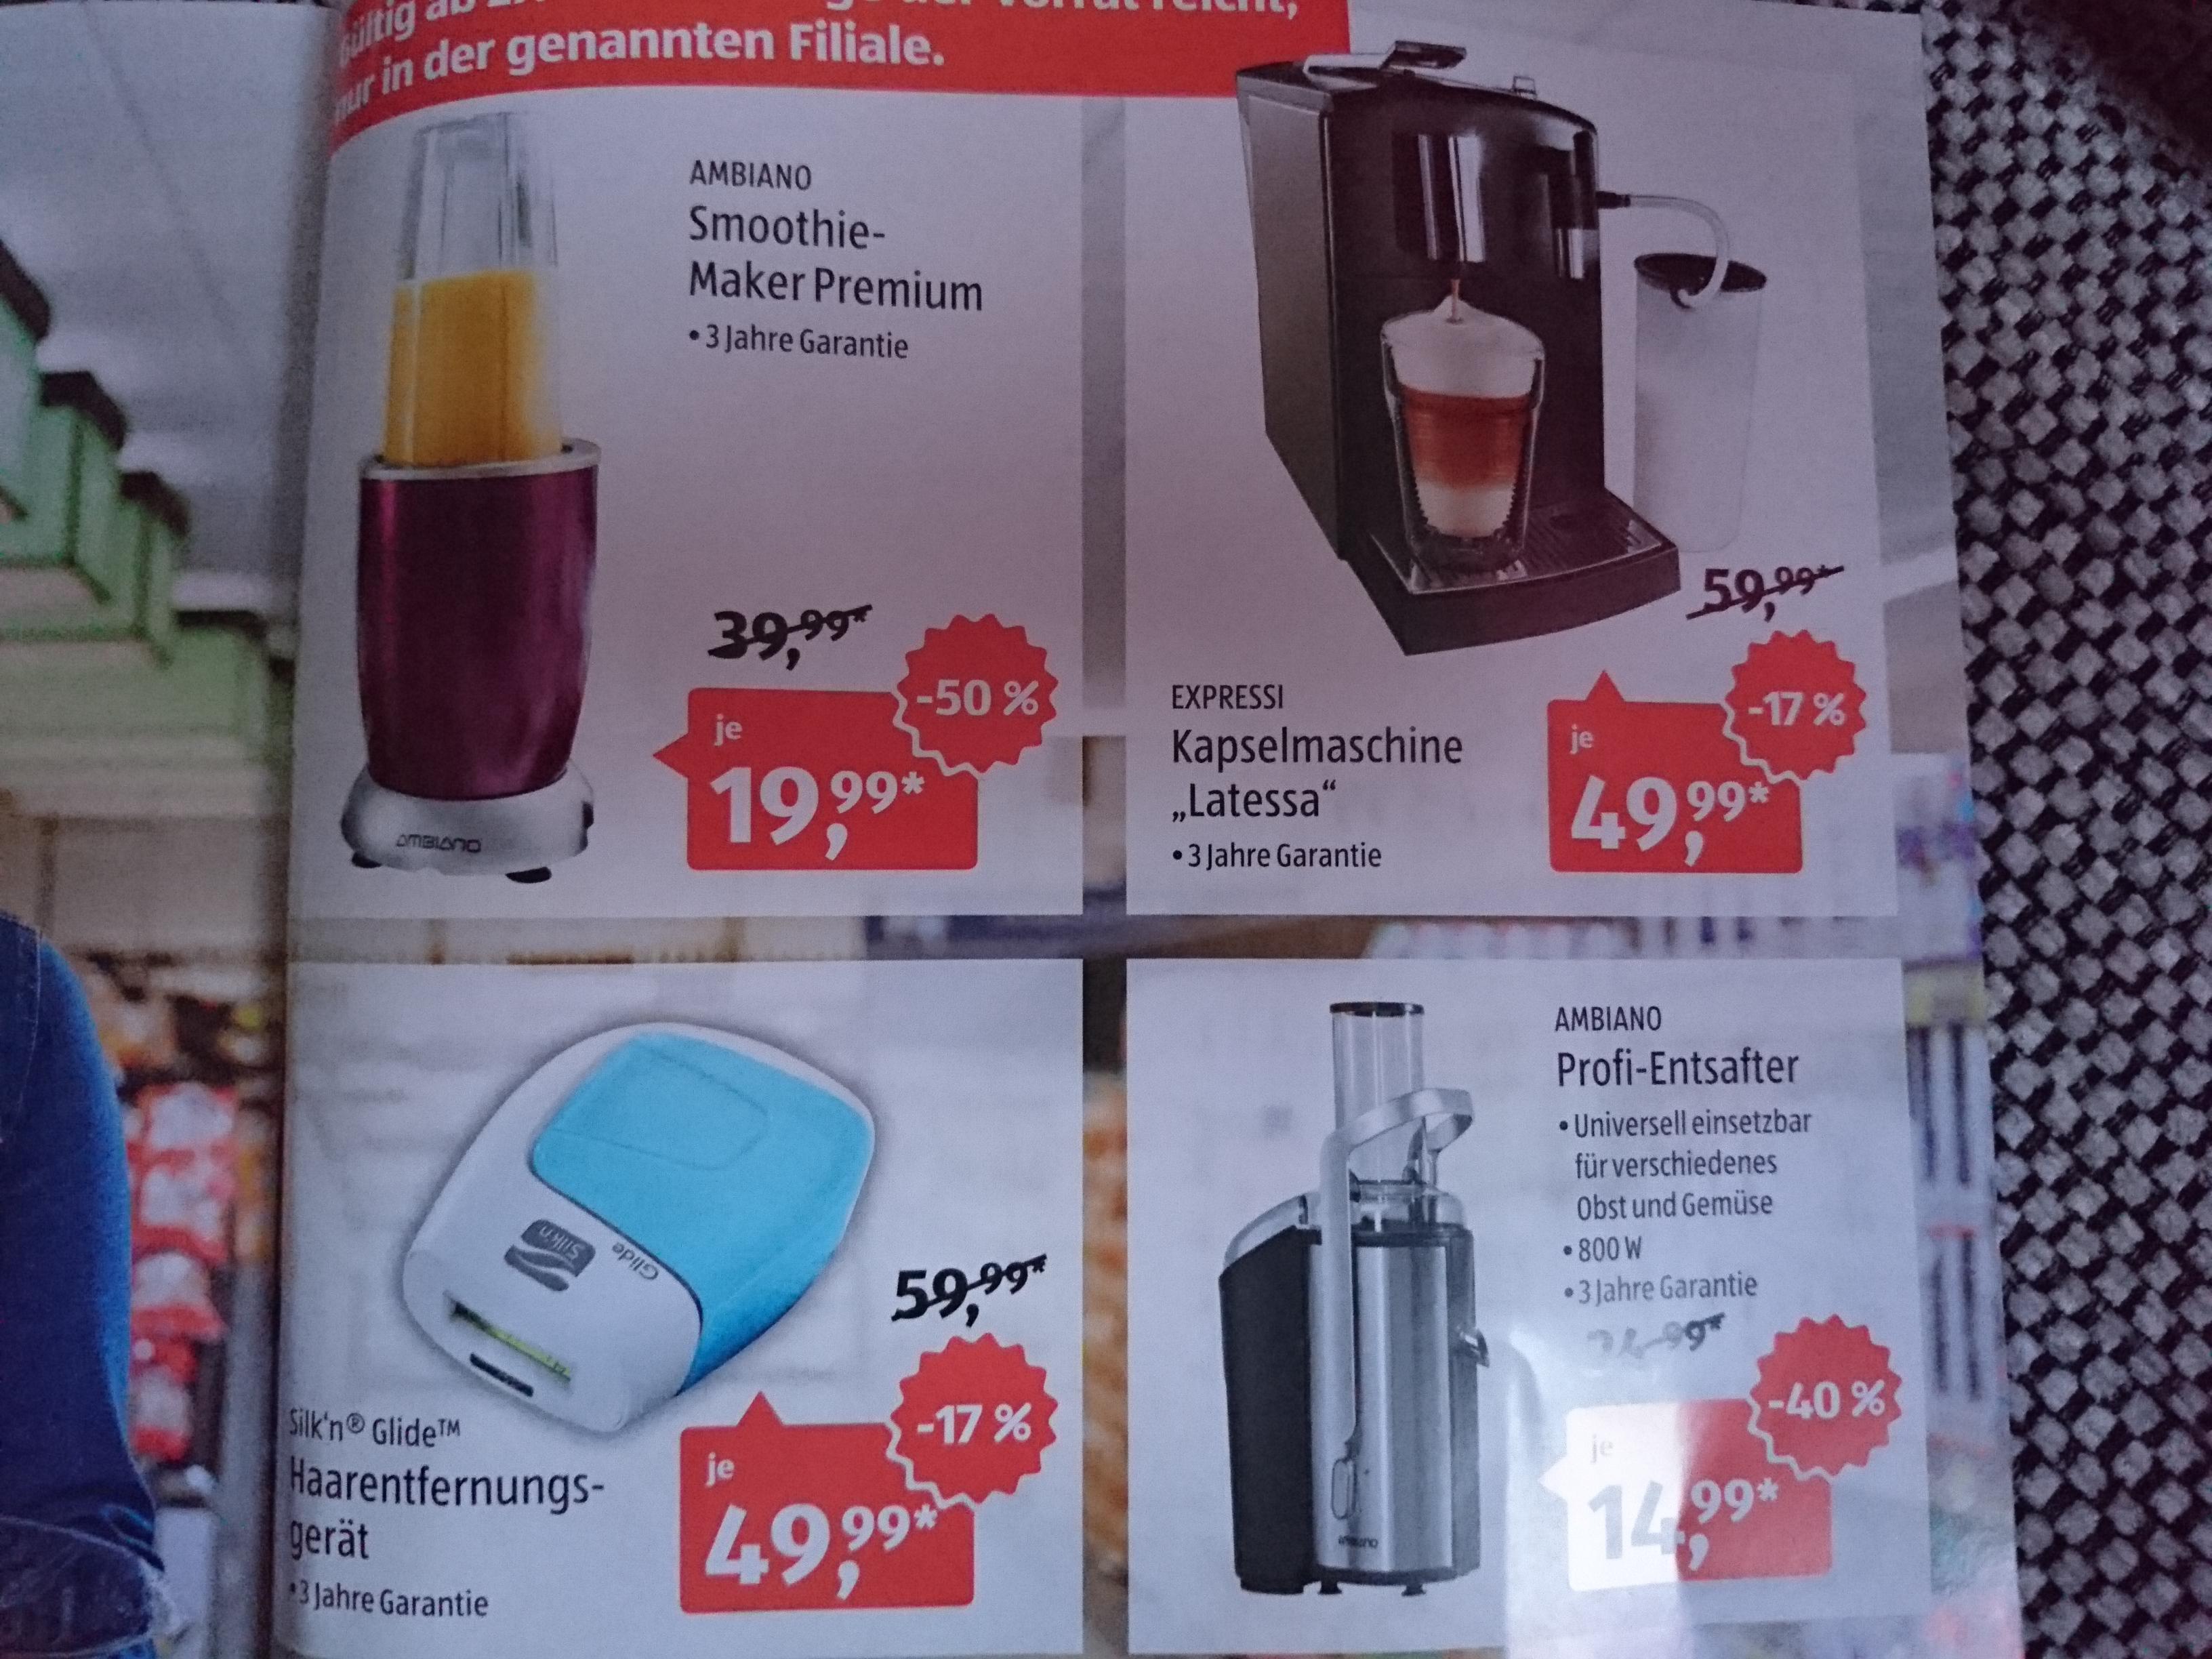 ALDI Bonn - Profi Entsafter 14,99€ und Smoothie Maker 19,99€ - Ab 27.04.